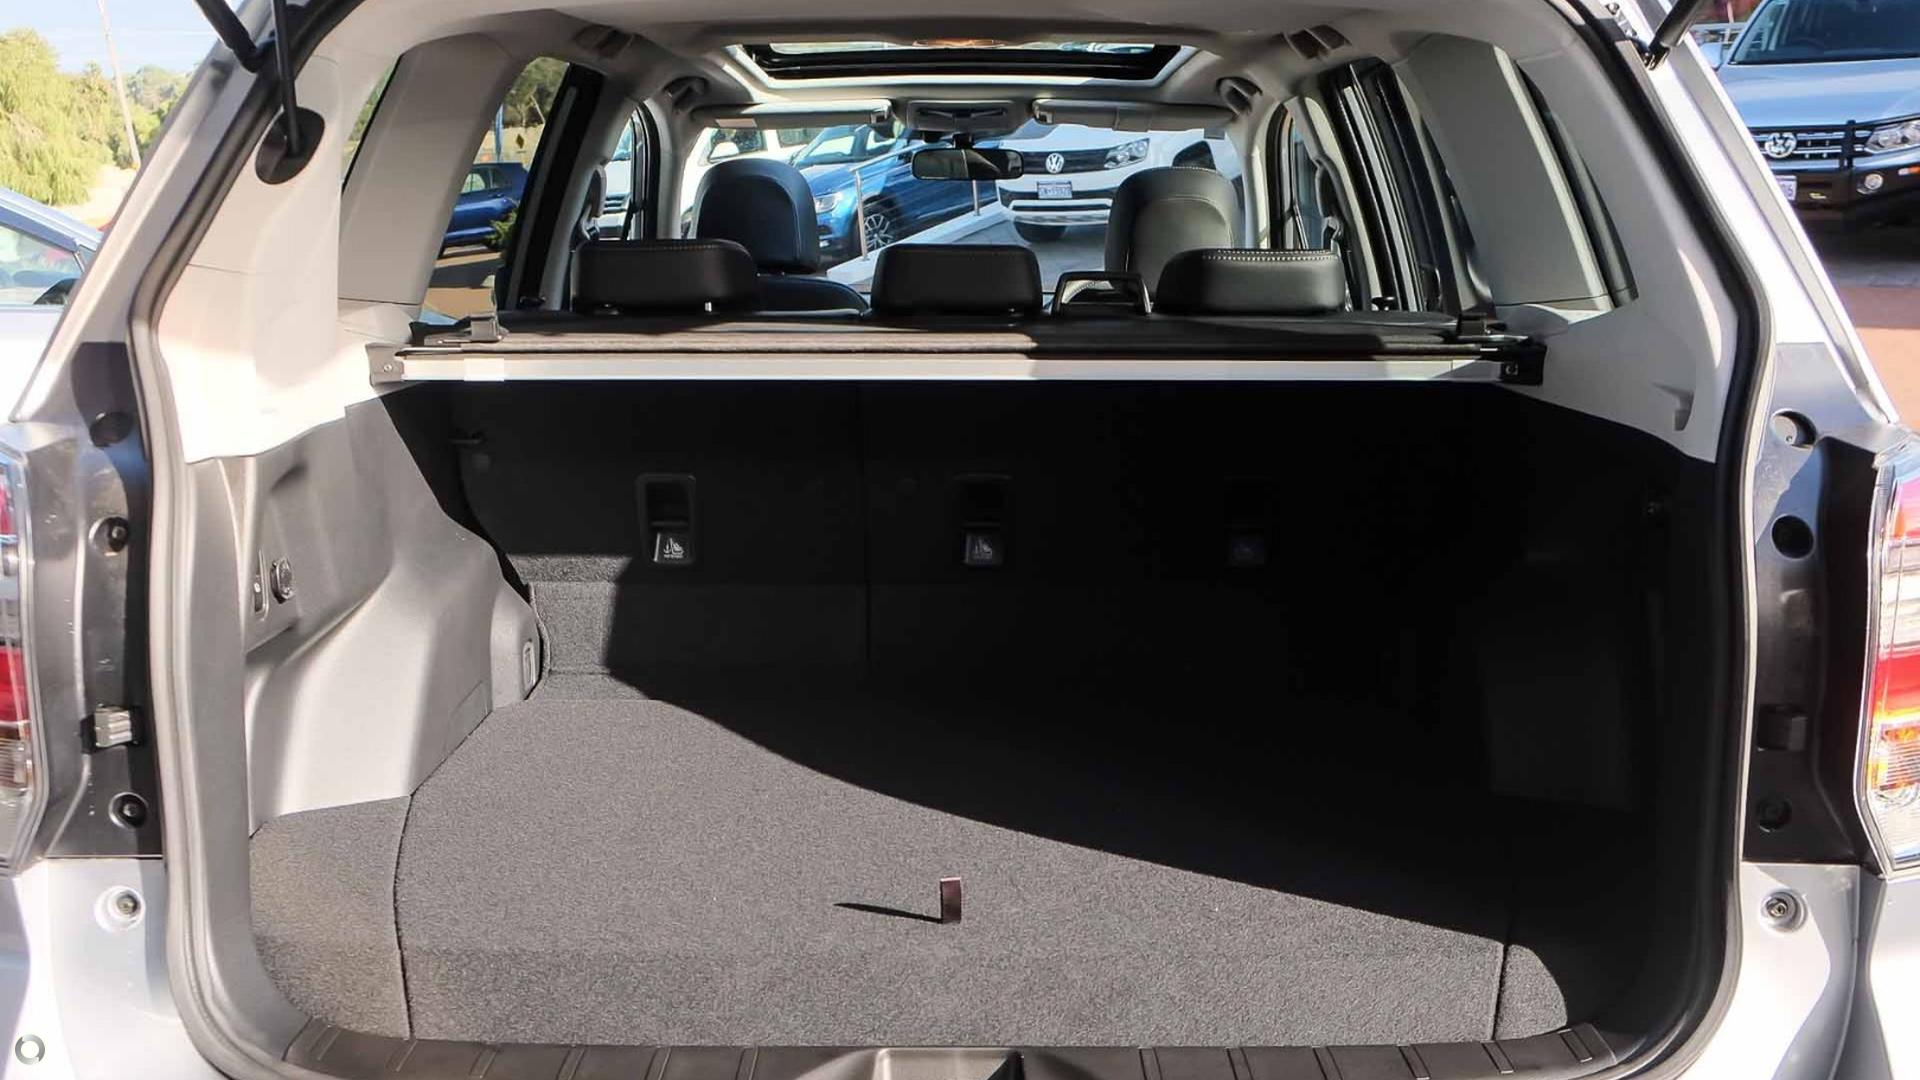 2018 Subaru Forester 2.5i-L Luxury S4